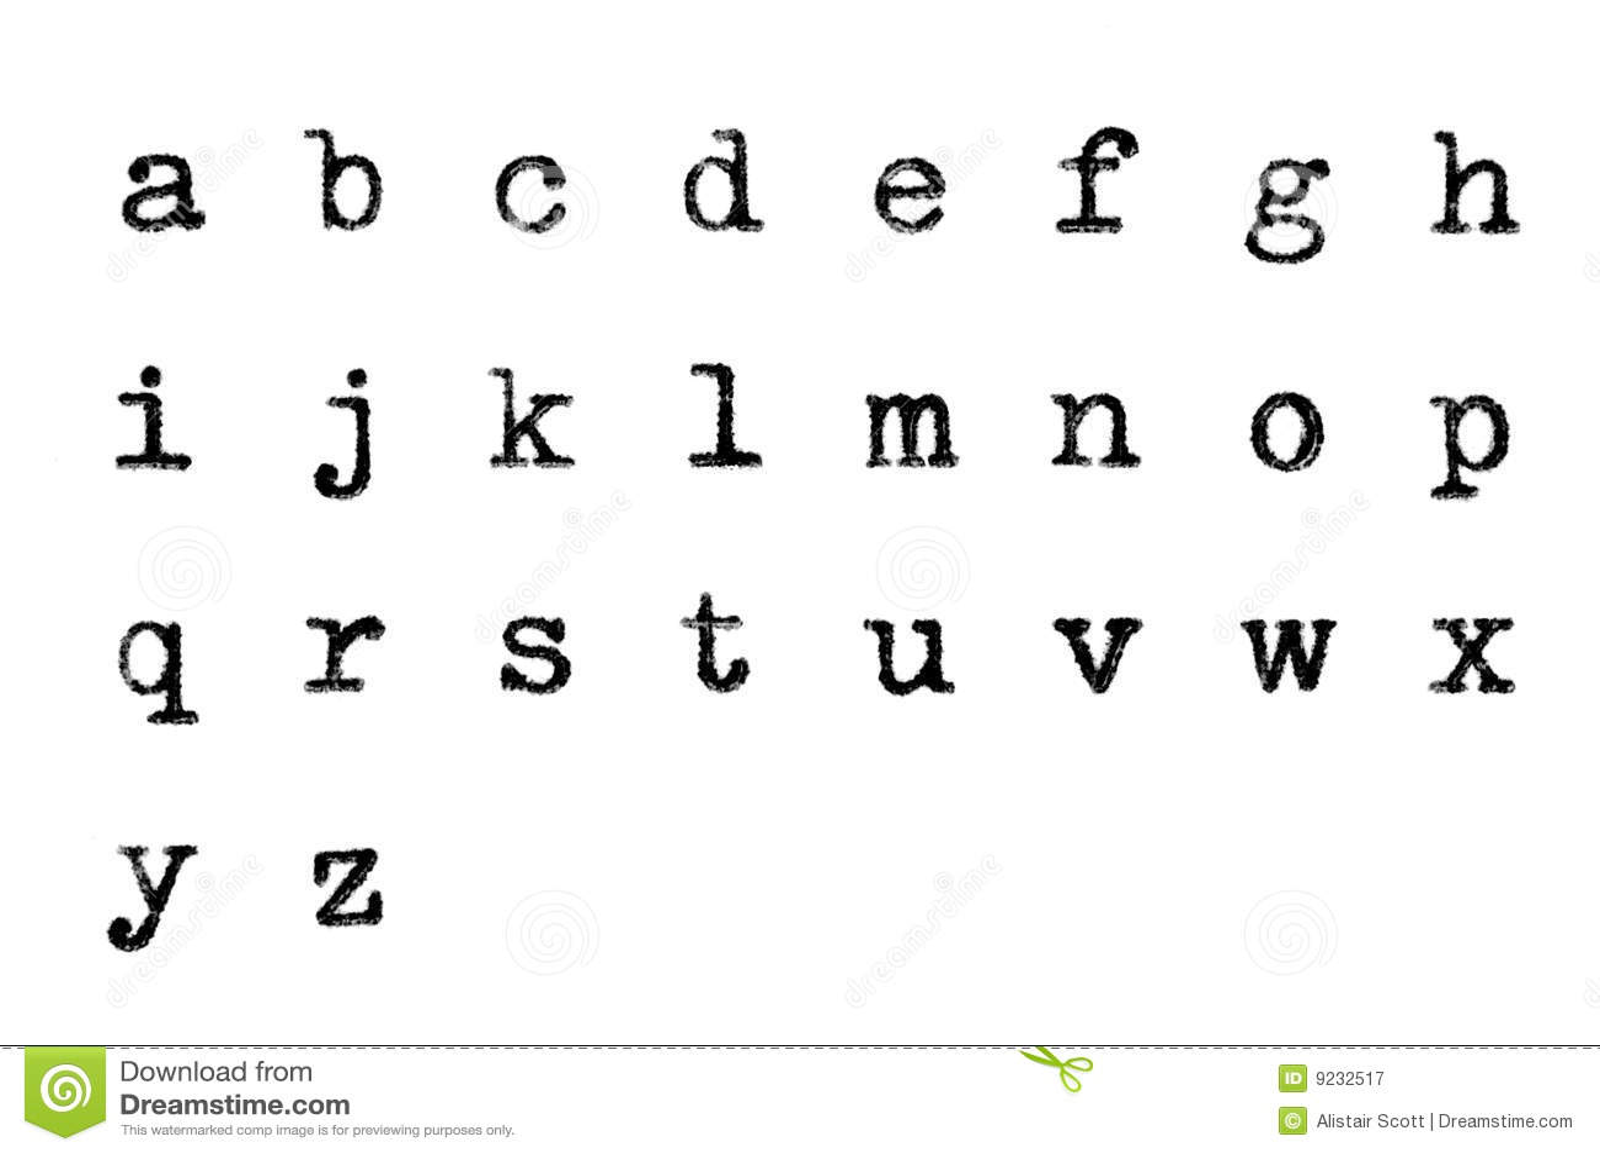 Grungy Font